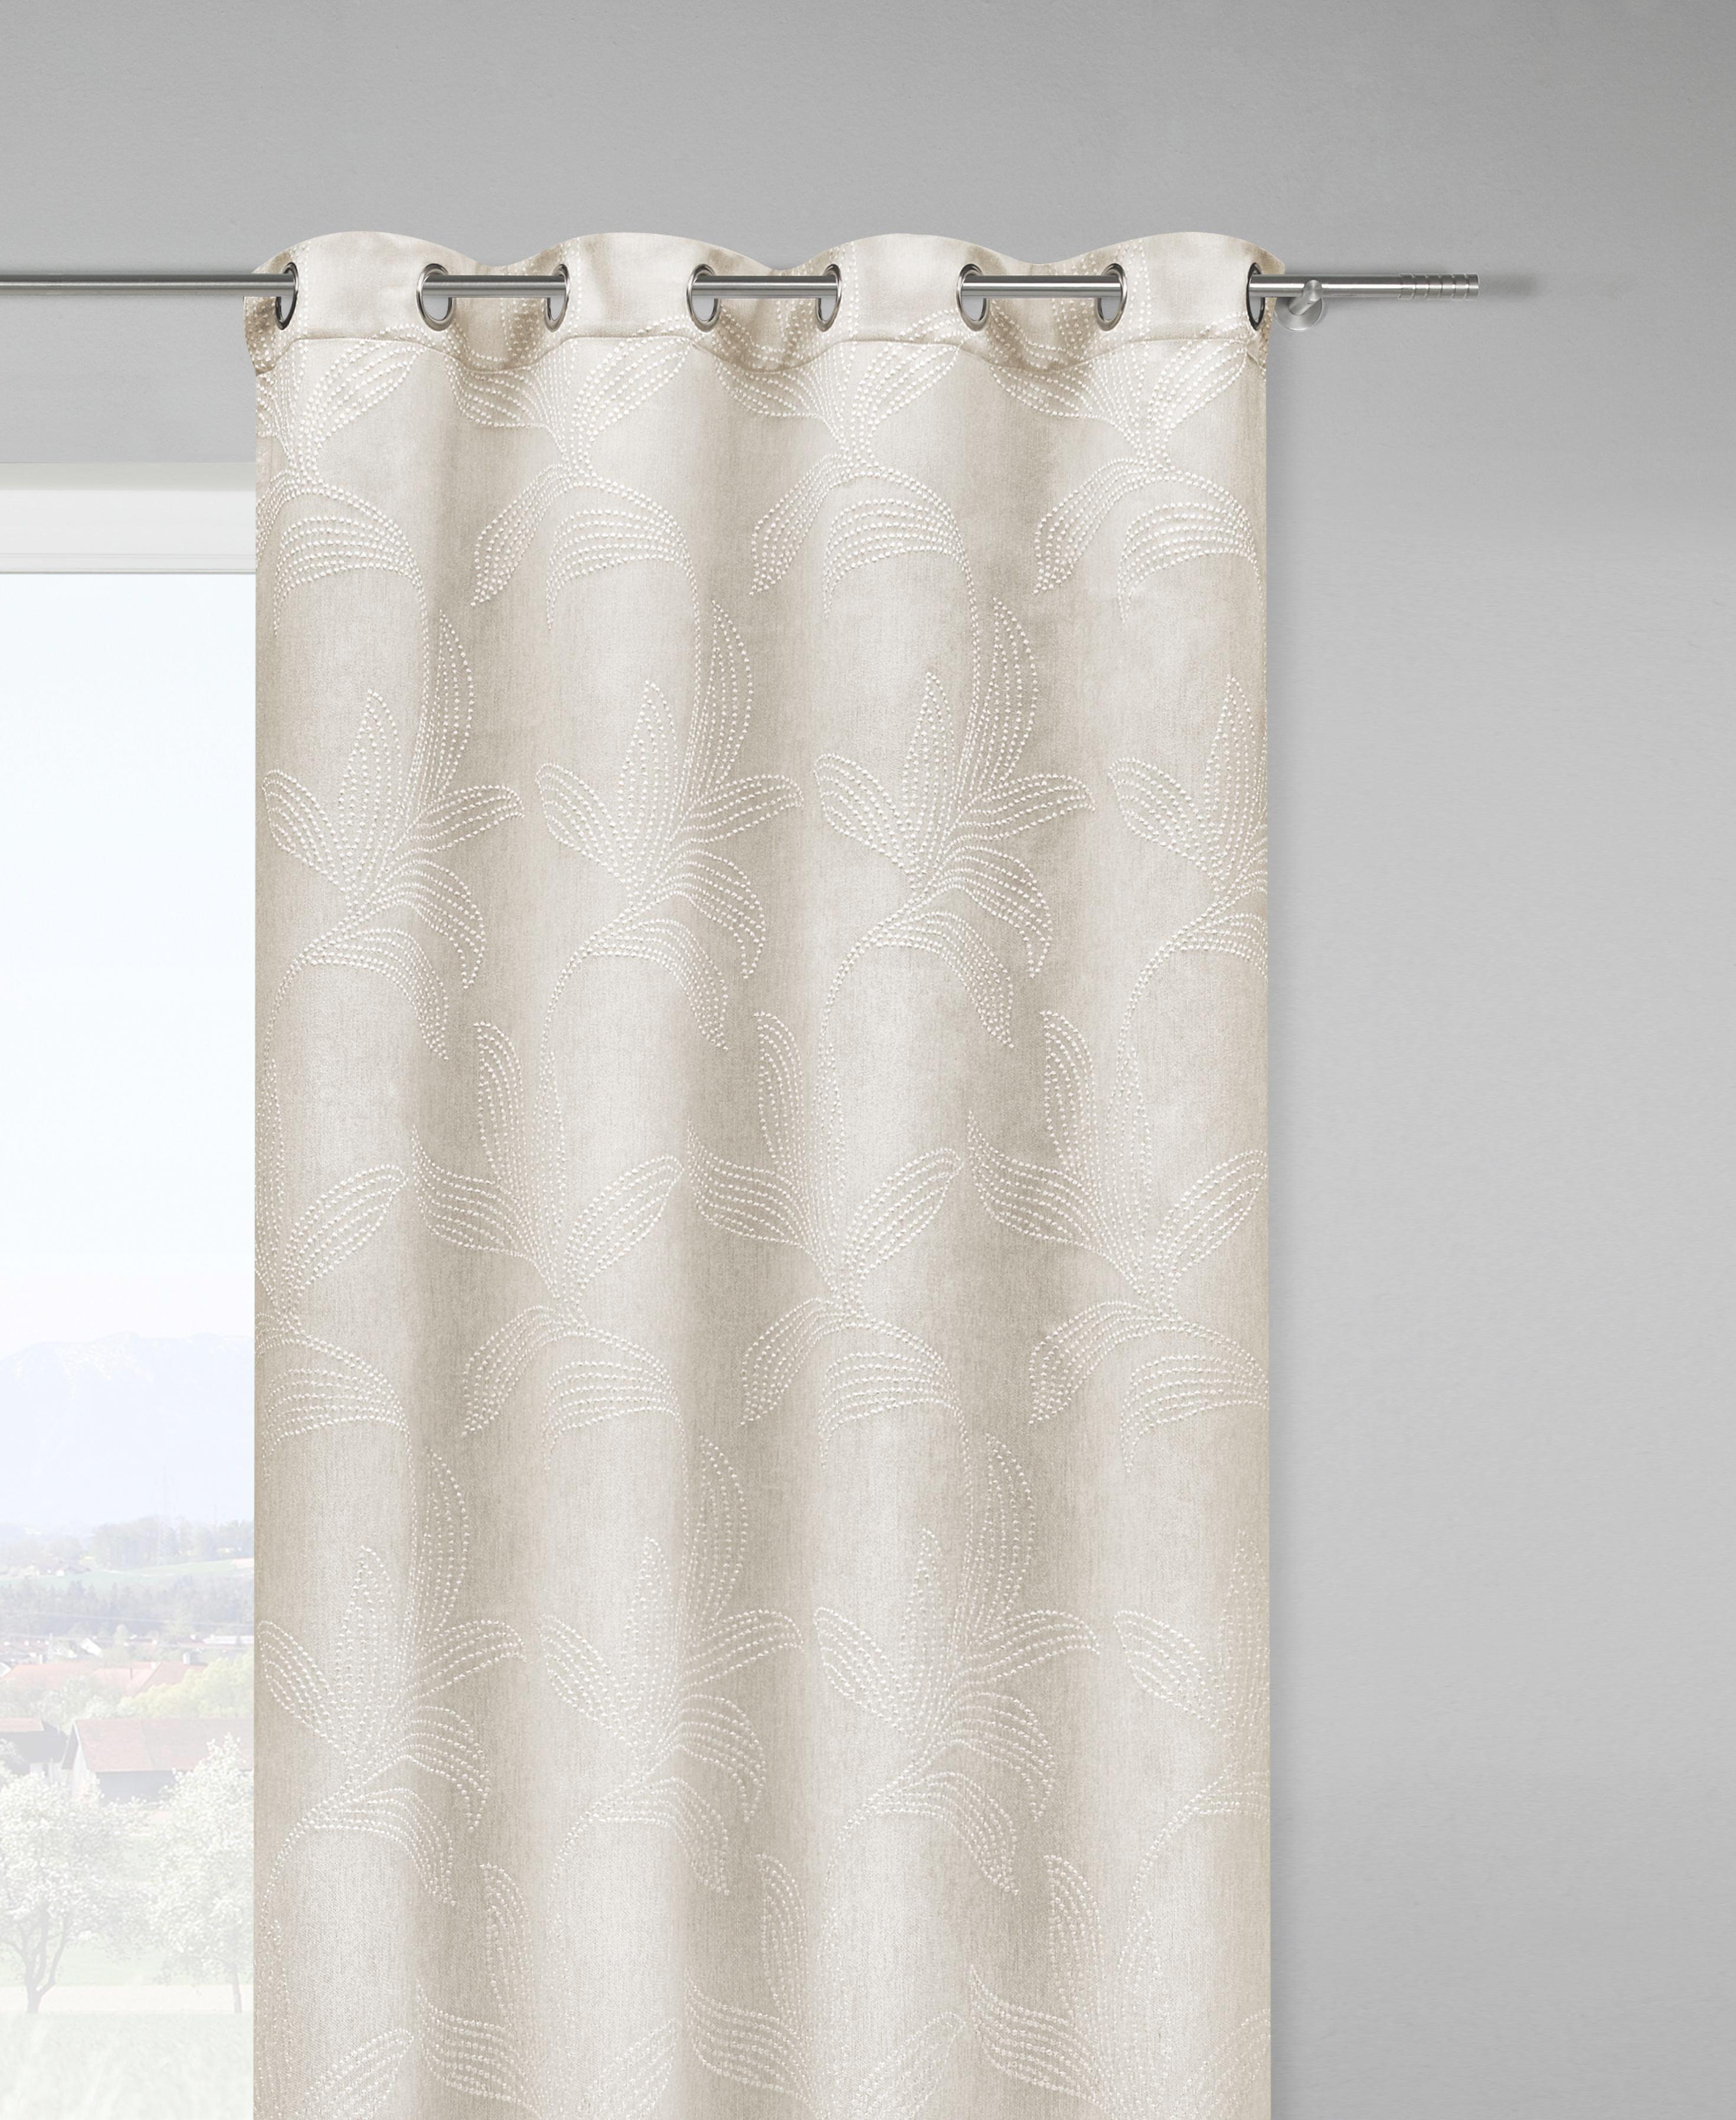 Ösenschal Linda in Natur, ca. 140x245cm - Naturfarben, KONVENTIONELL, Textil (140/245cm) - MÖMAX modern living